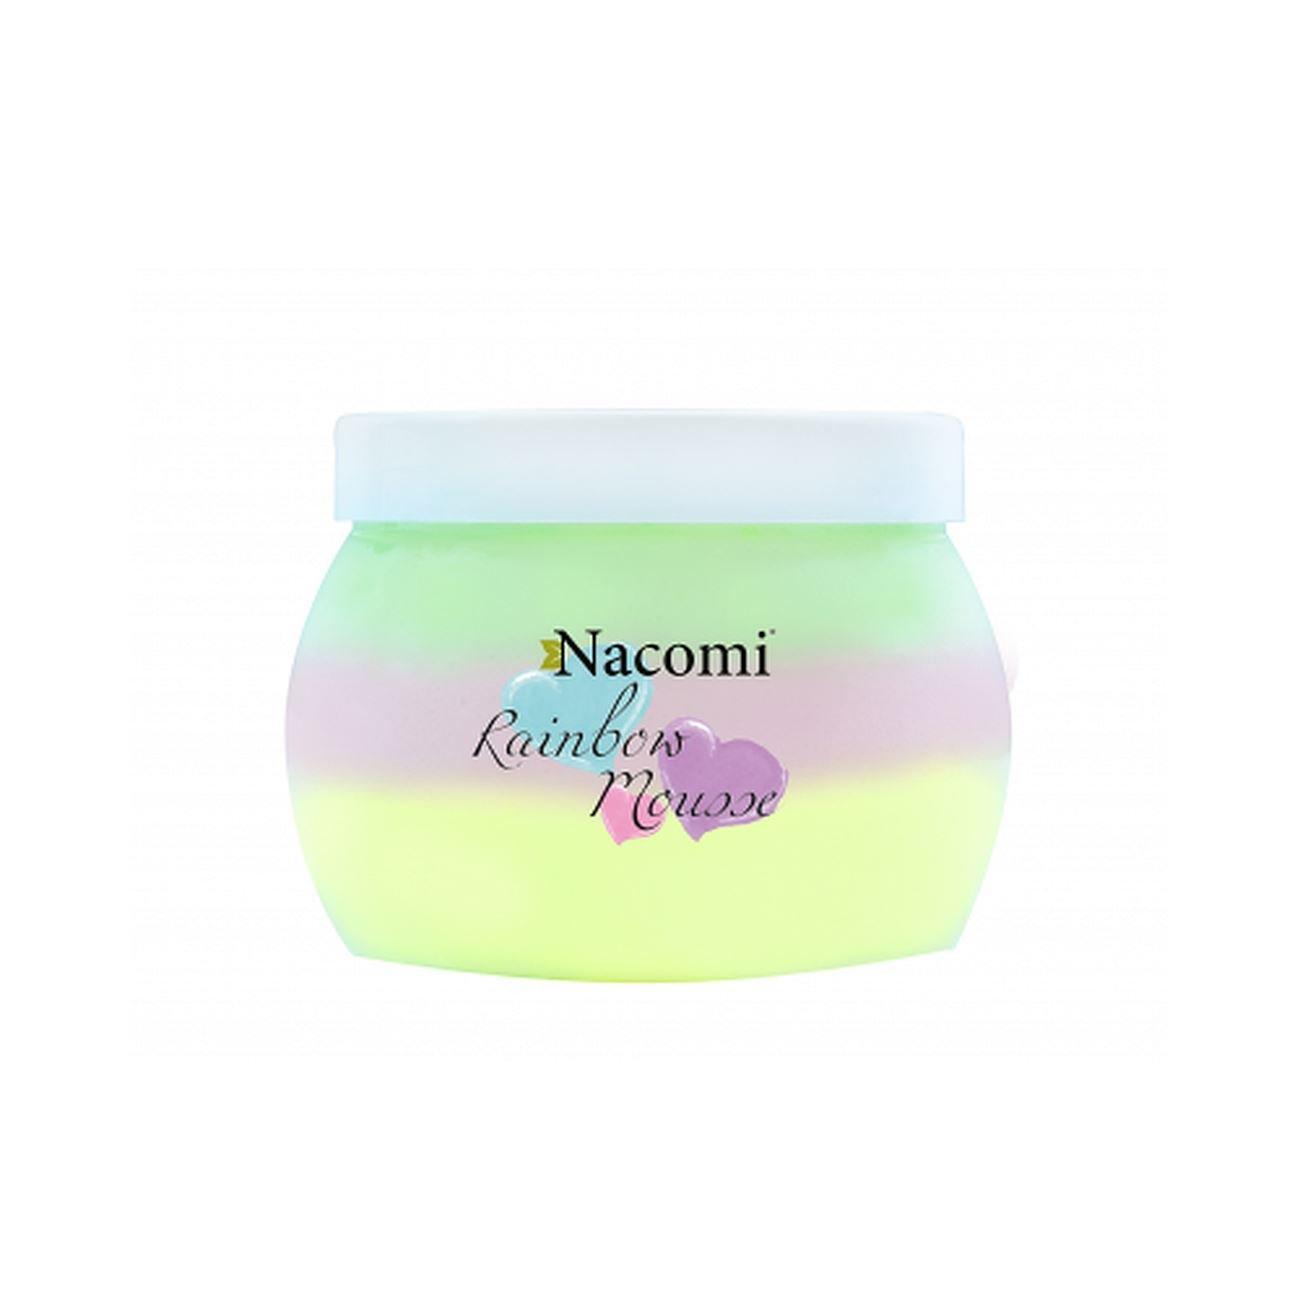 Nacomi Rainbow Natural Body Mousse 200ml